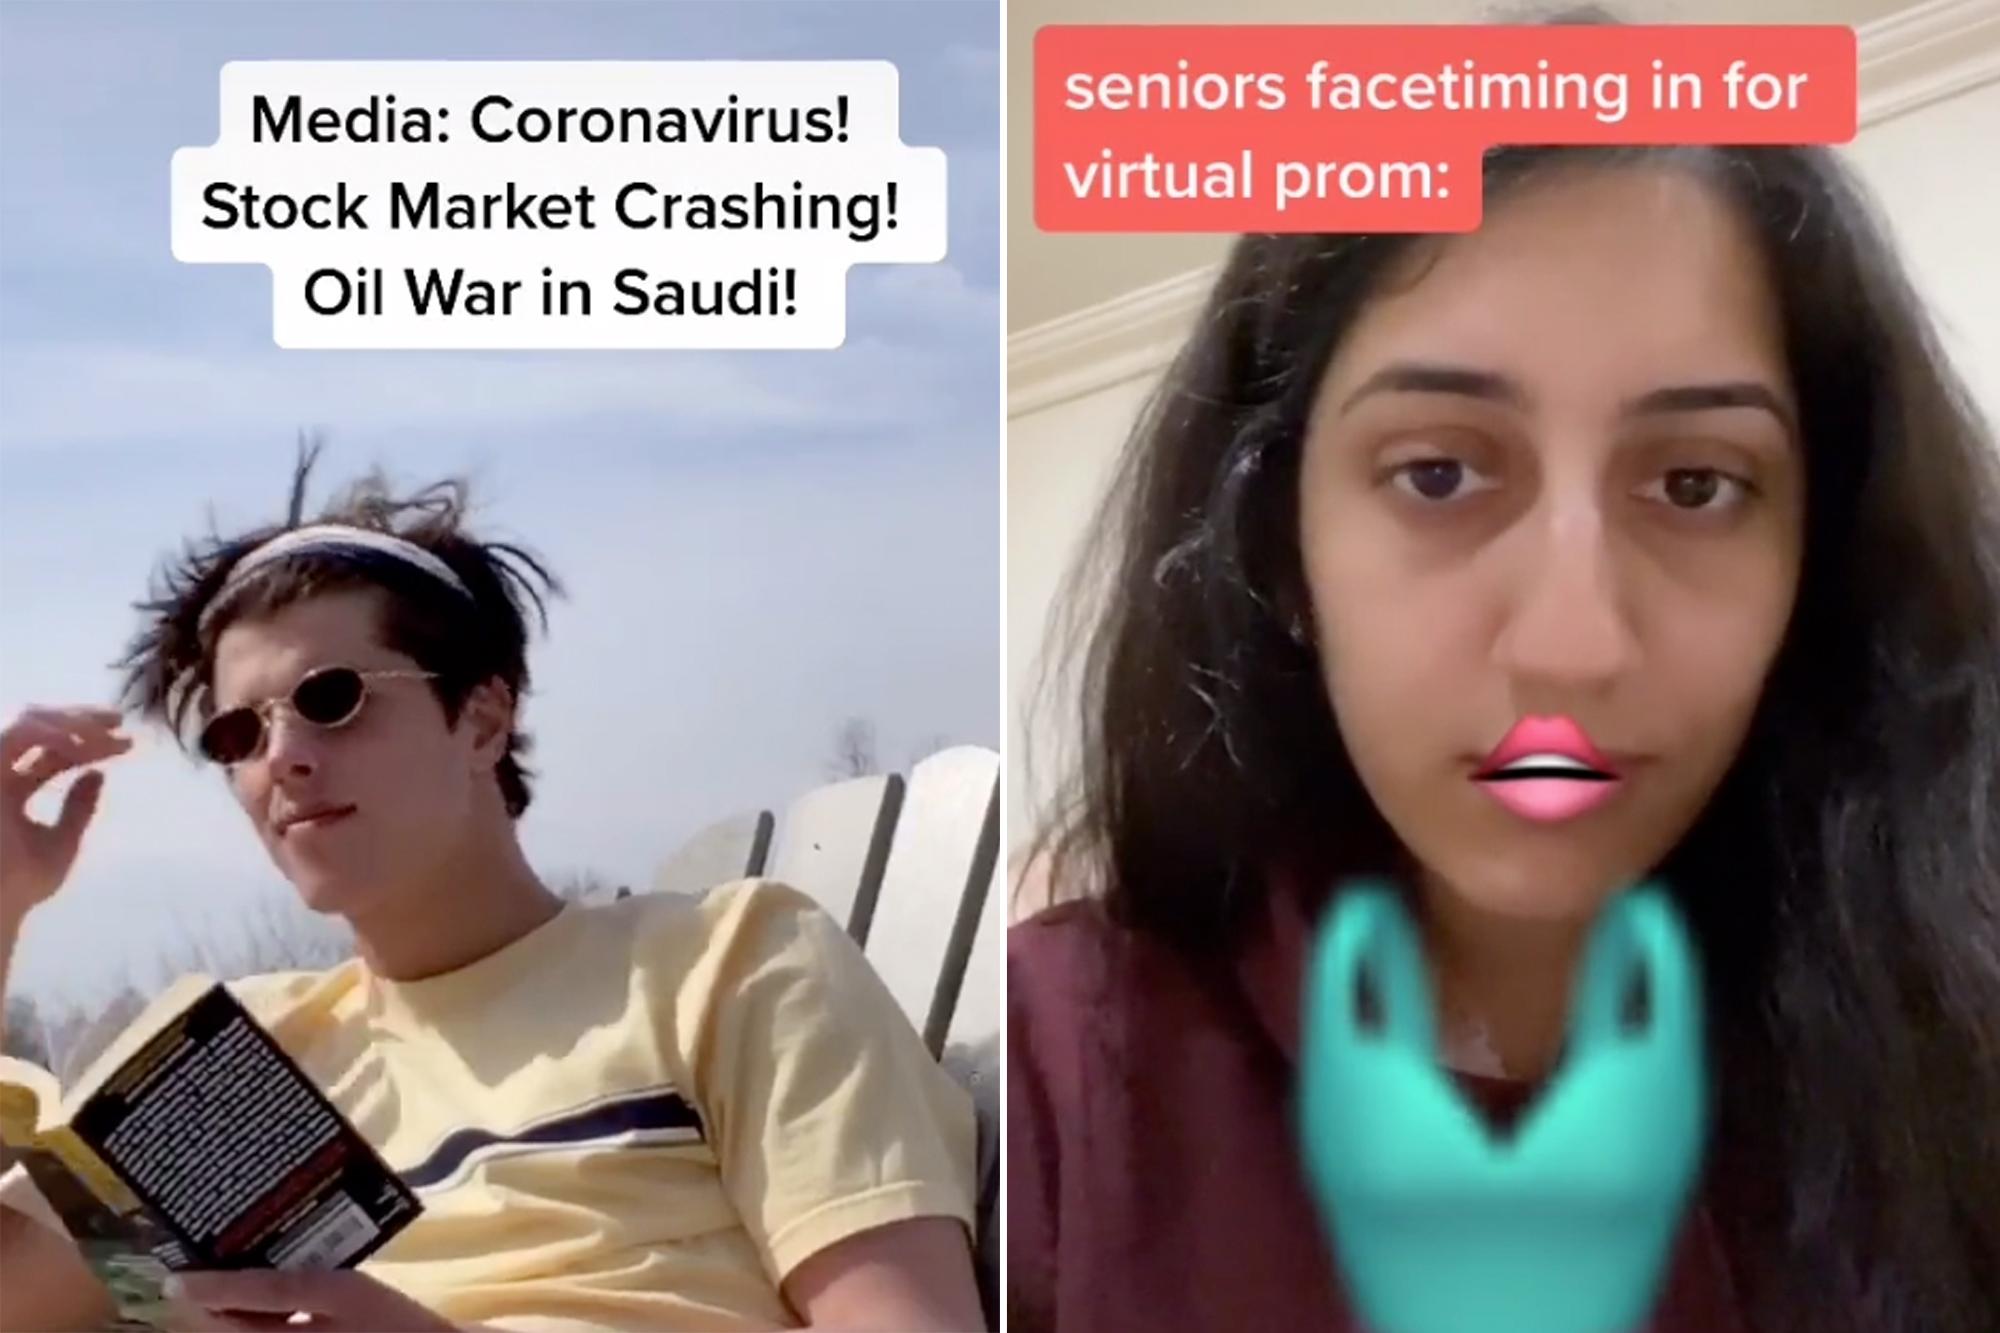 Funny Quarantine Memes And Tiktoks To Make You Smile Amid Coronavirus